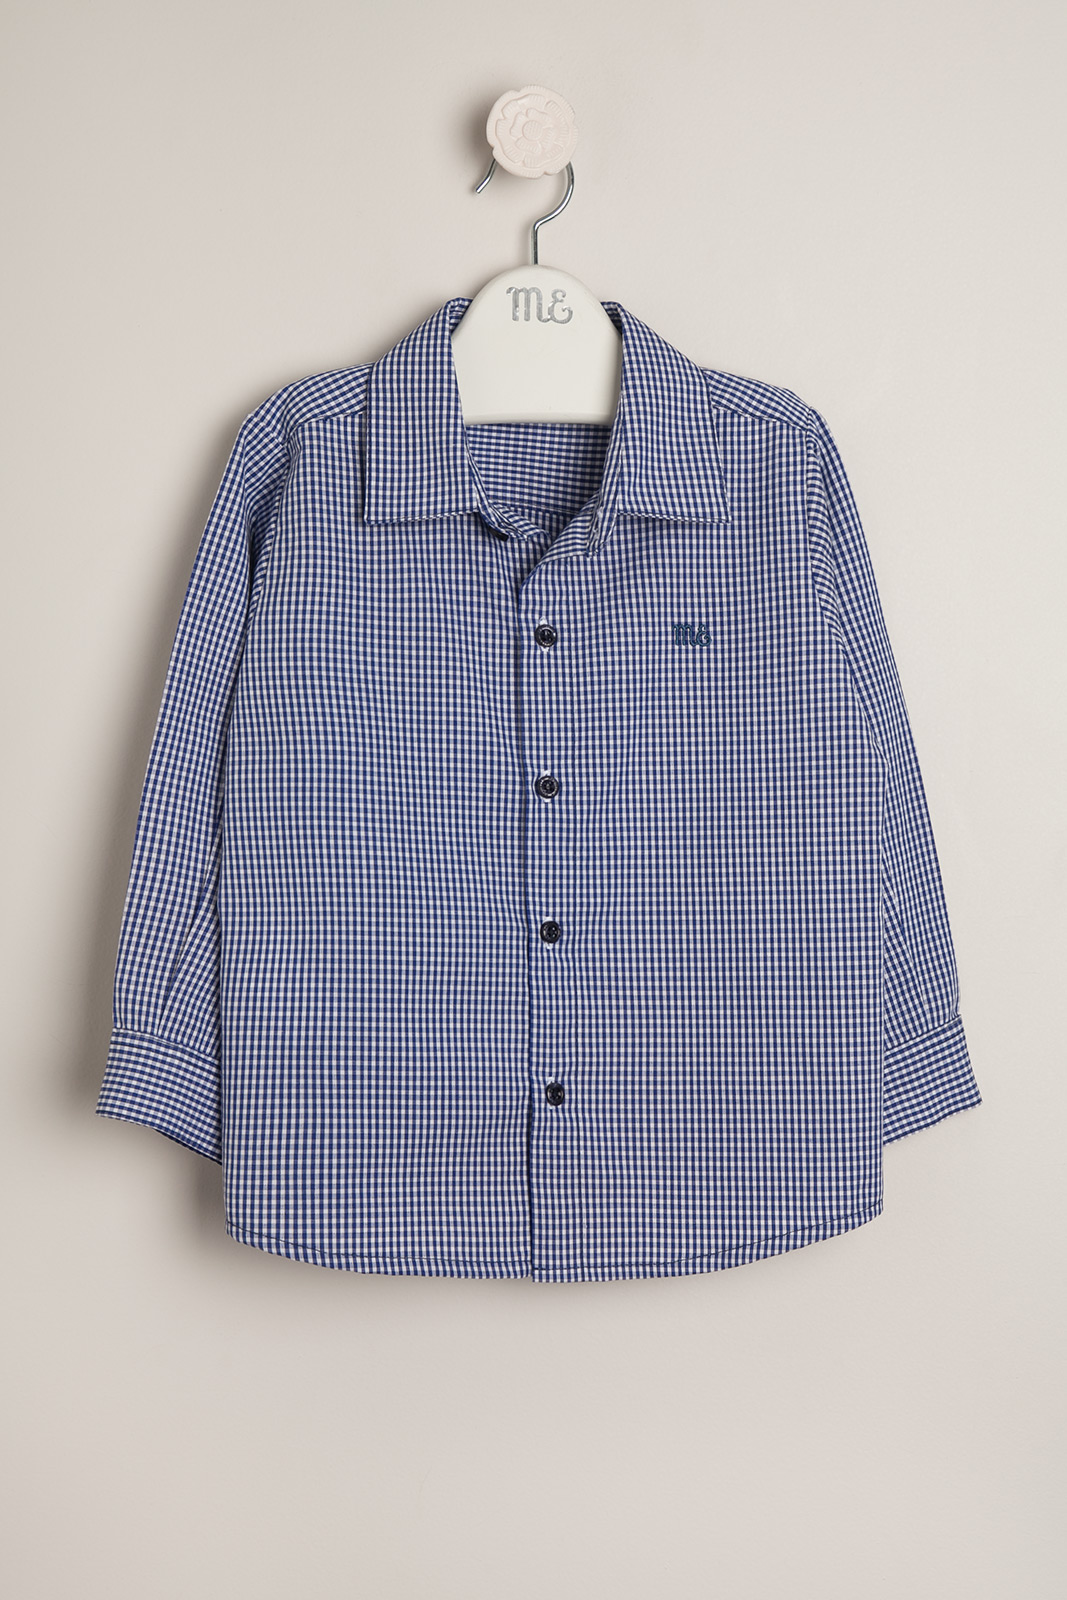 Camisa cuadrille bl/az